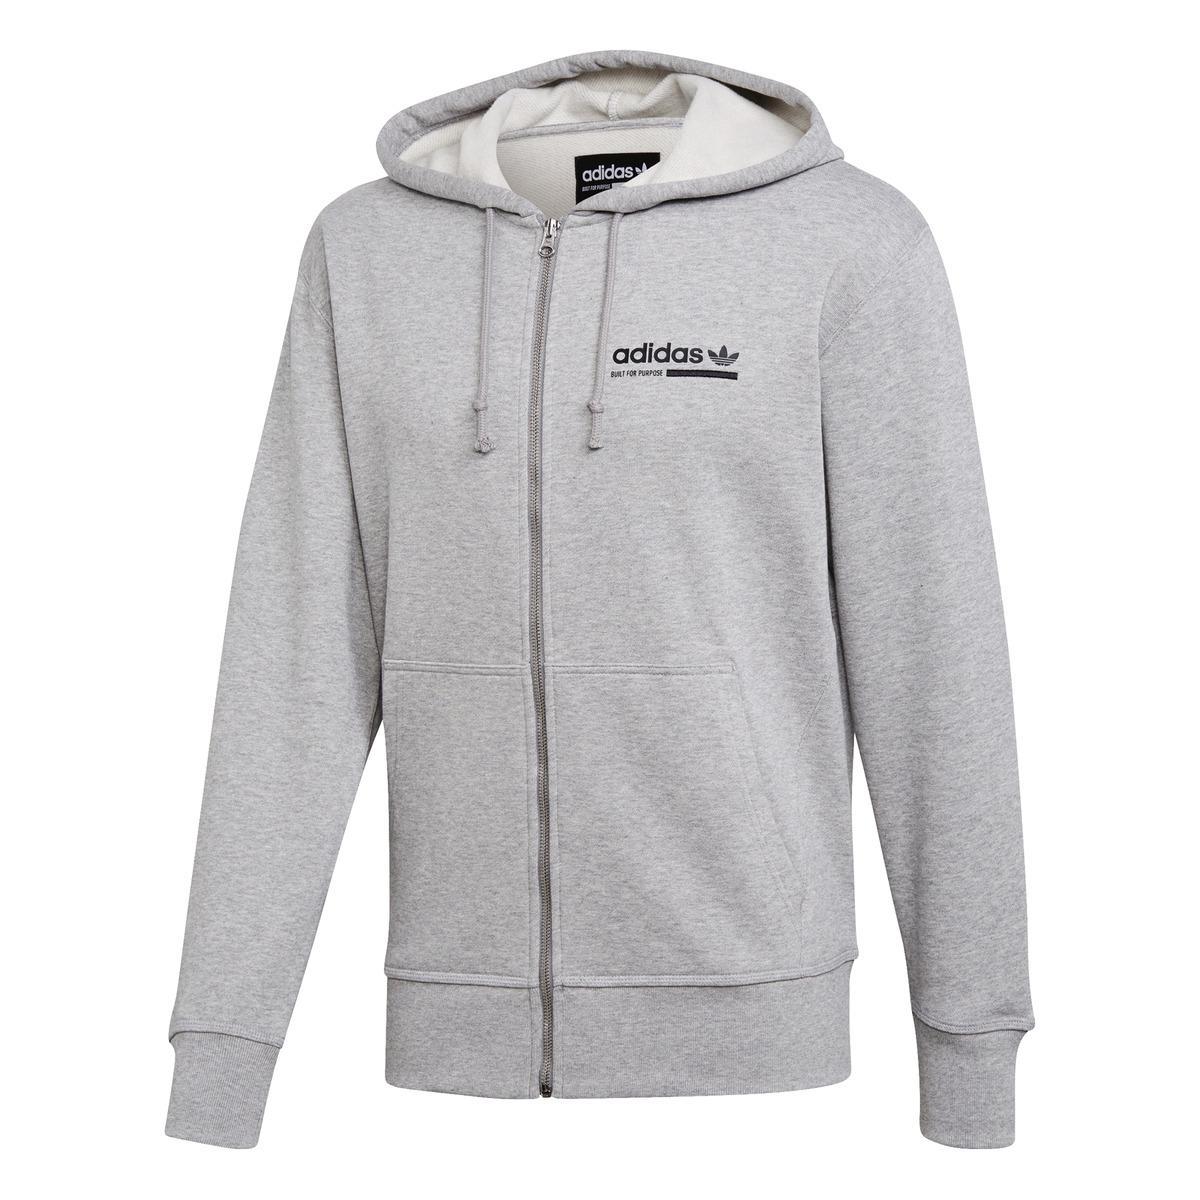 cf92723e5b03 adidas Originals Sweatshirt in Gray for Men - Lyst